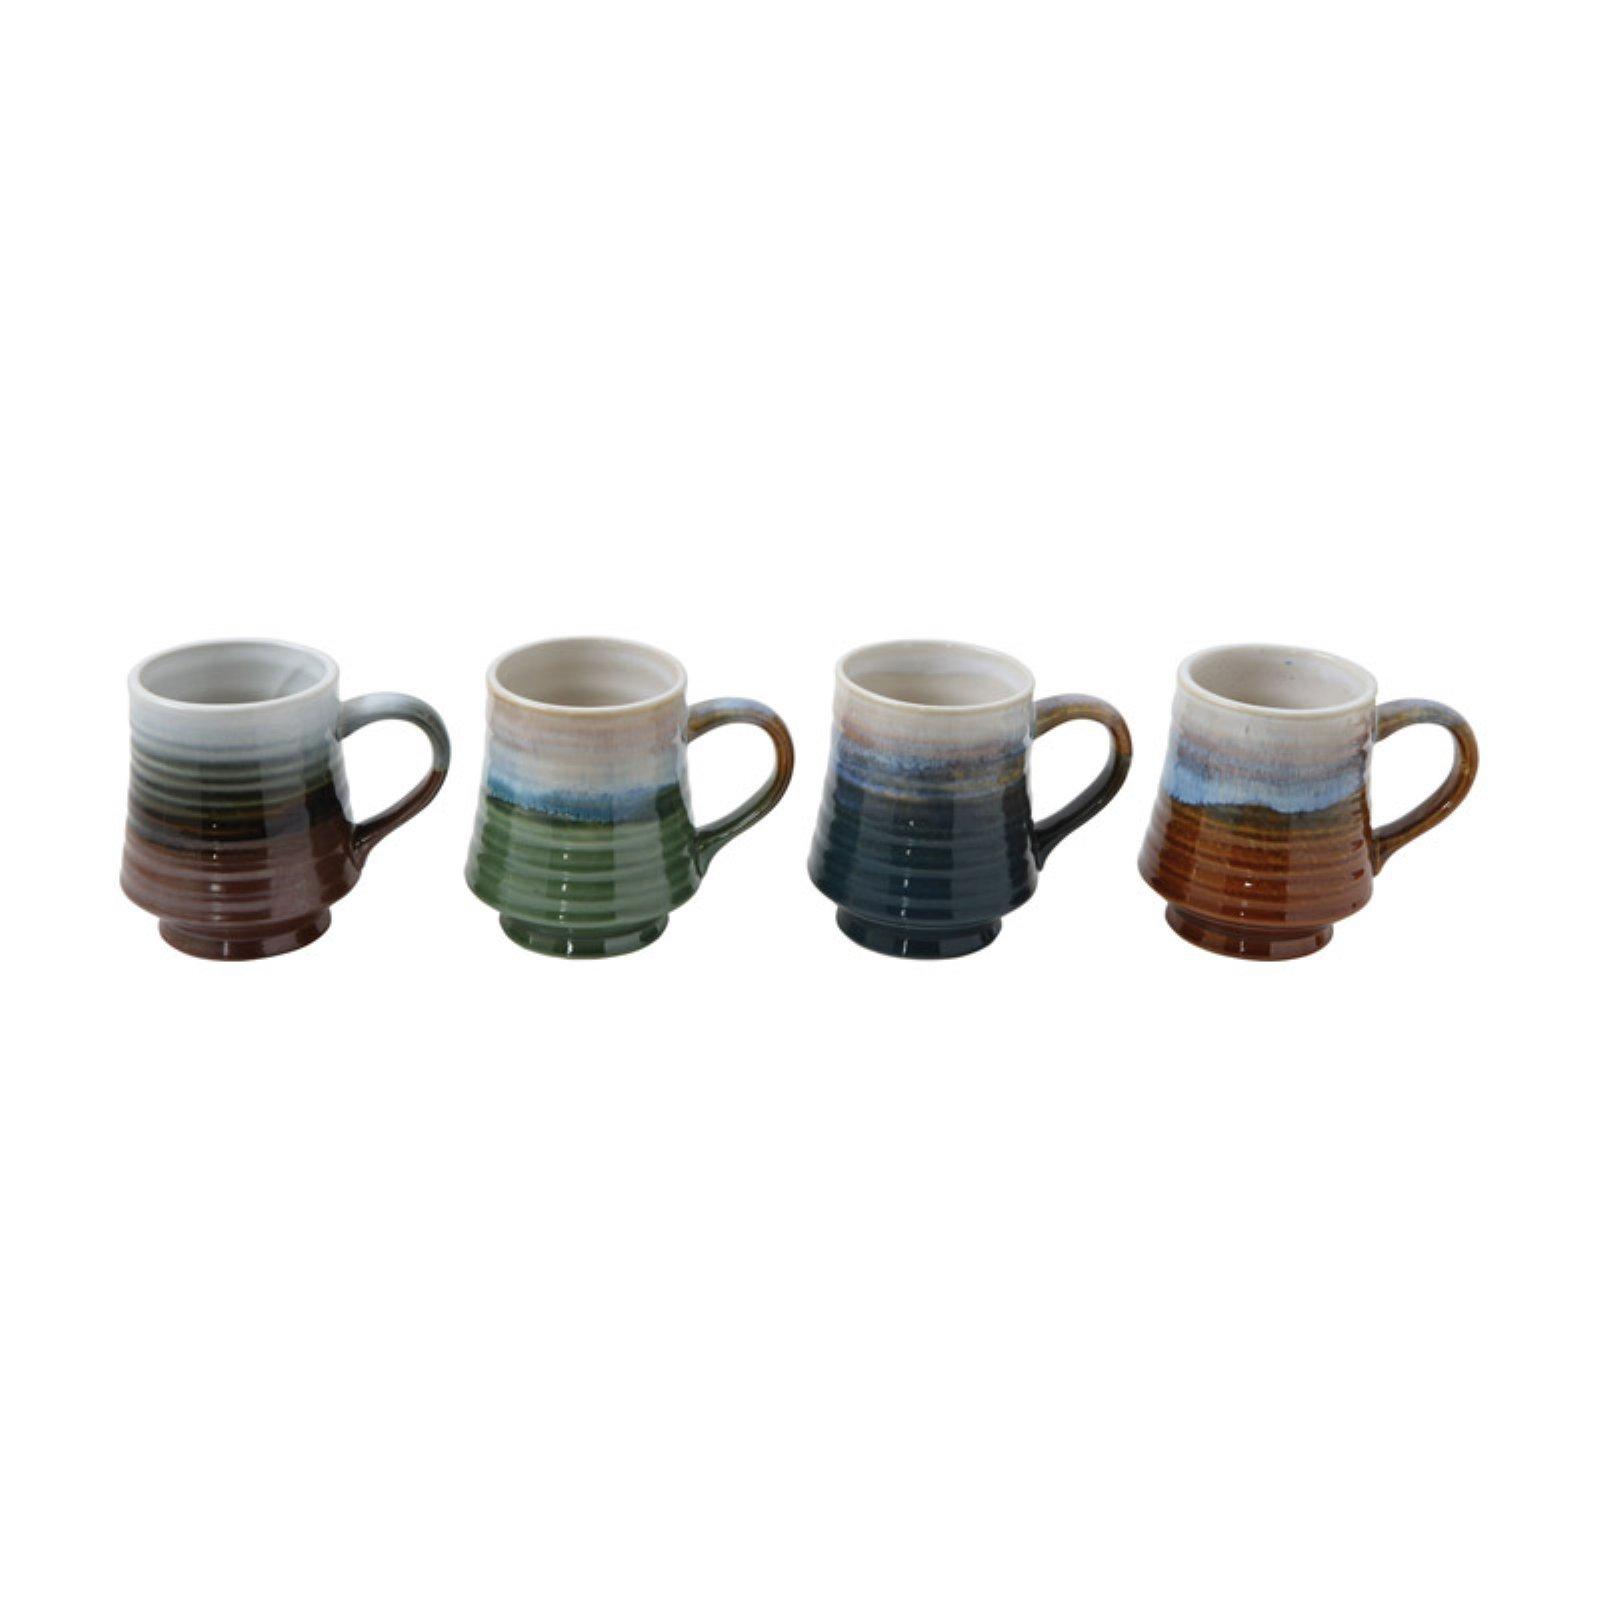 3R Studios Reactive Glaze Stoneware Mug